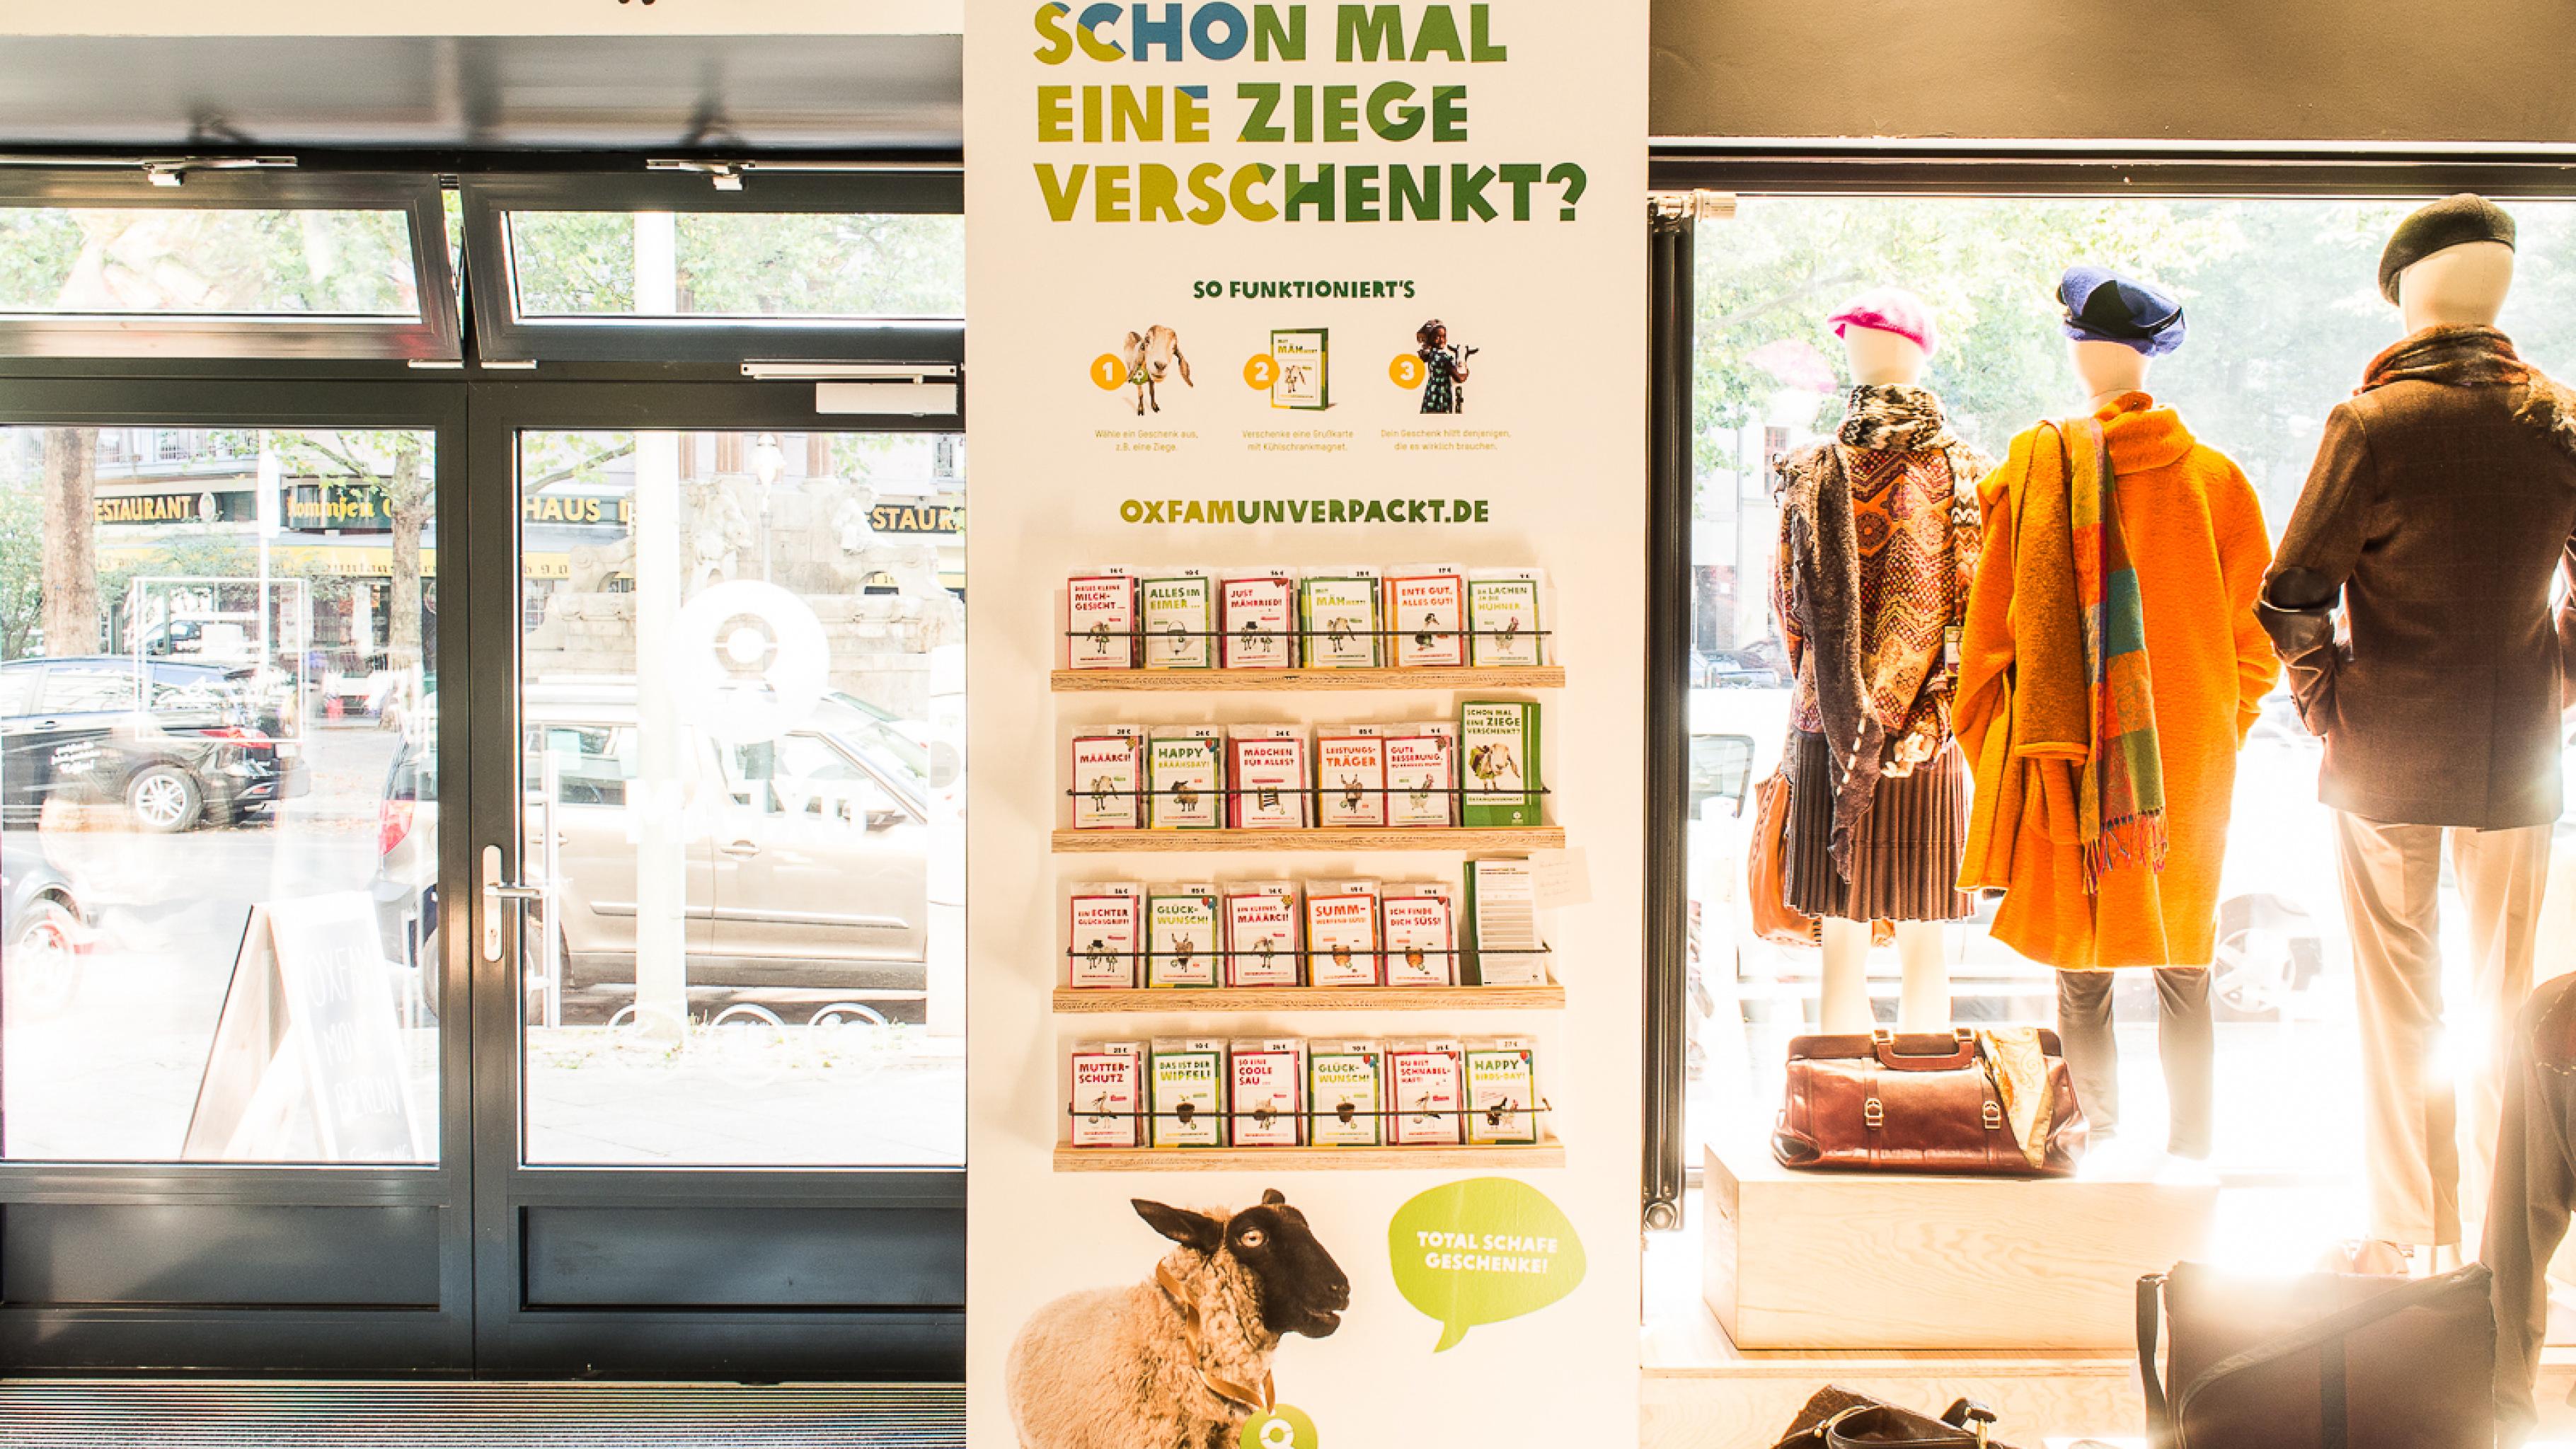 Oxfam MOVE Berlin - OxfamUnverpackt